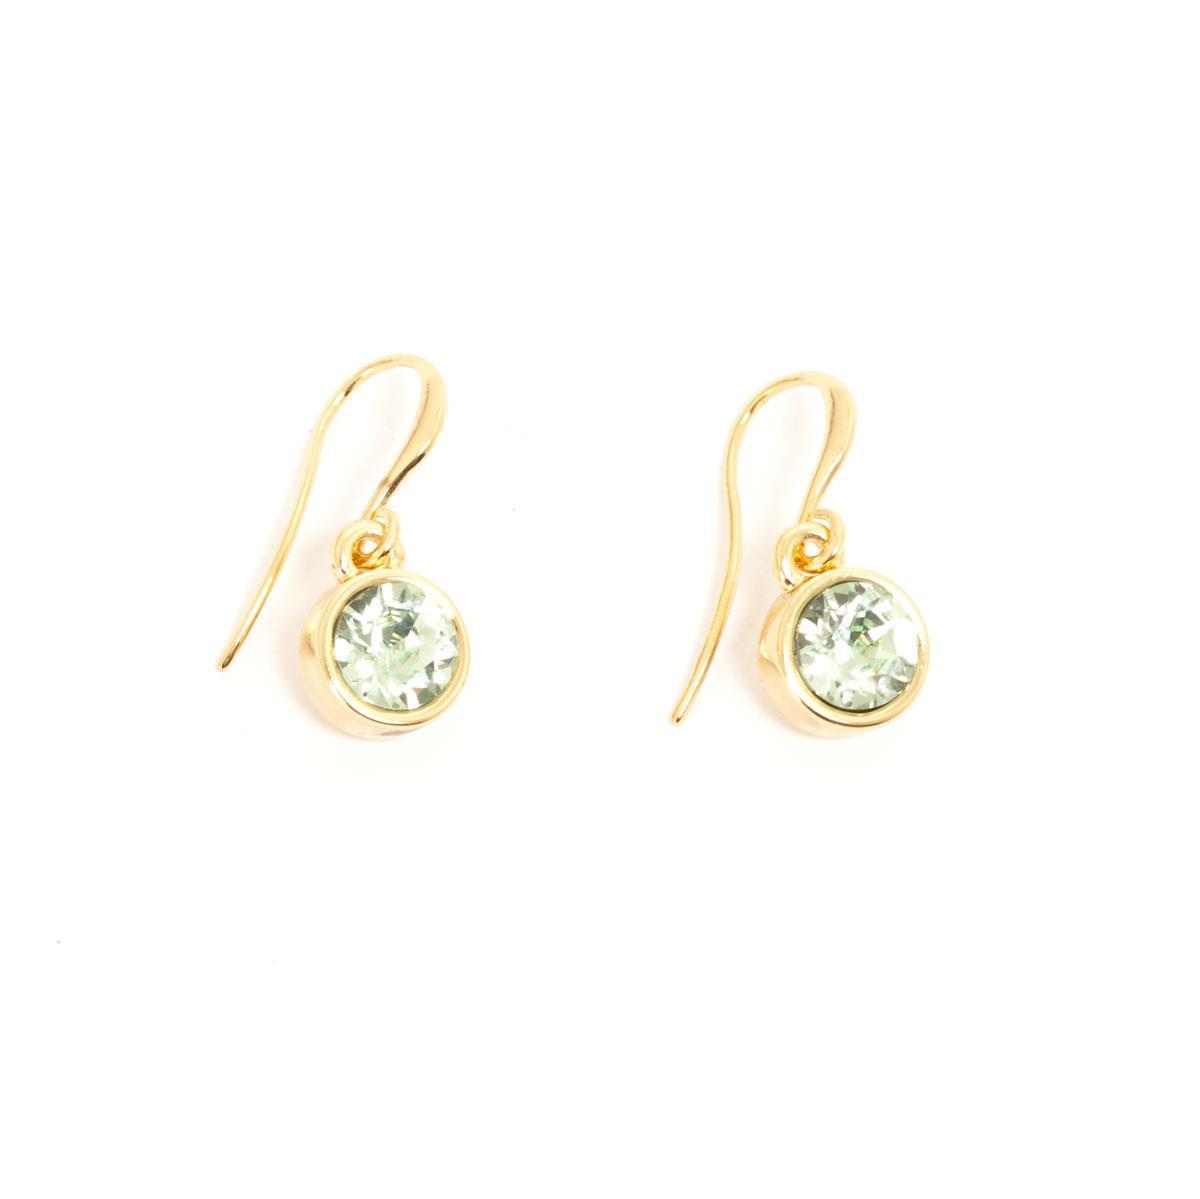 swarovski smykker norge